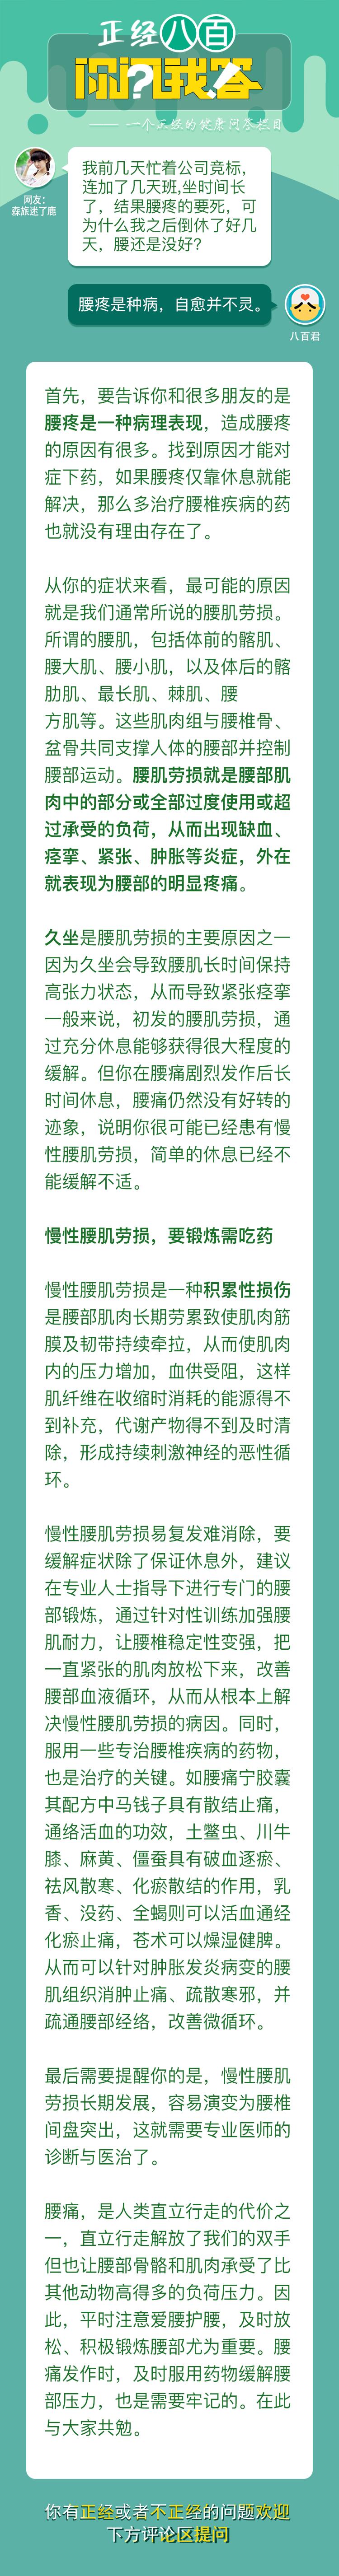 https://resource.chunyu.mobi/@/media/images/news/138575_fe1680e6626c2a75